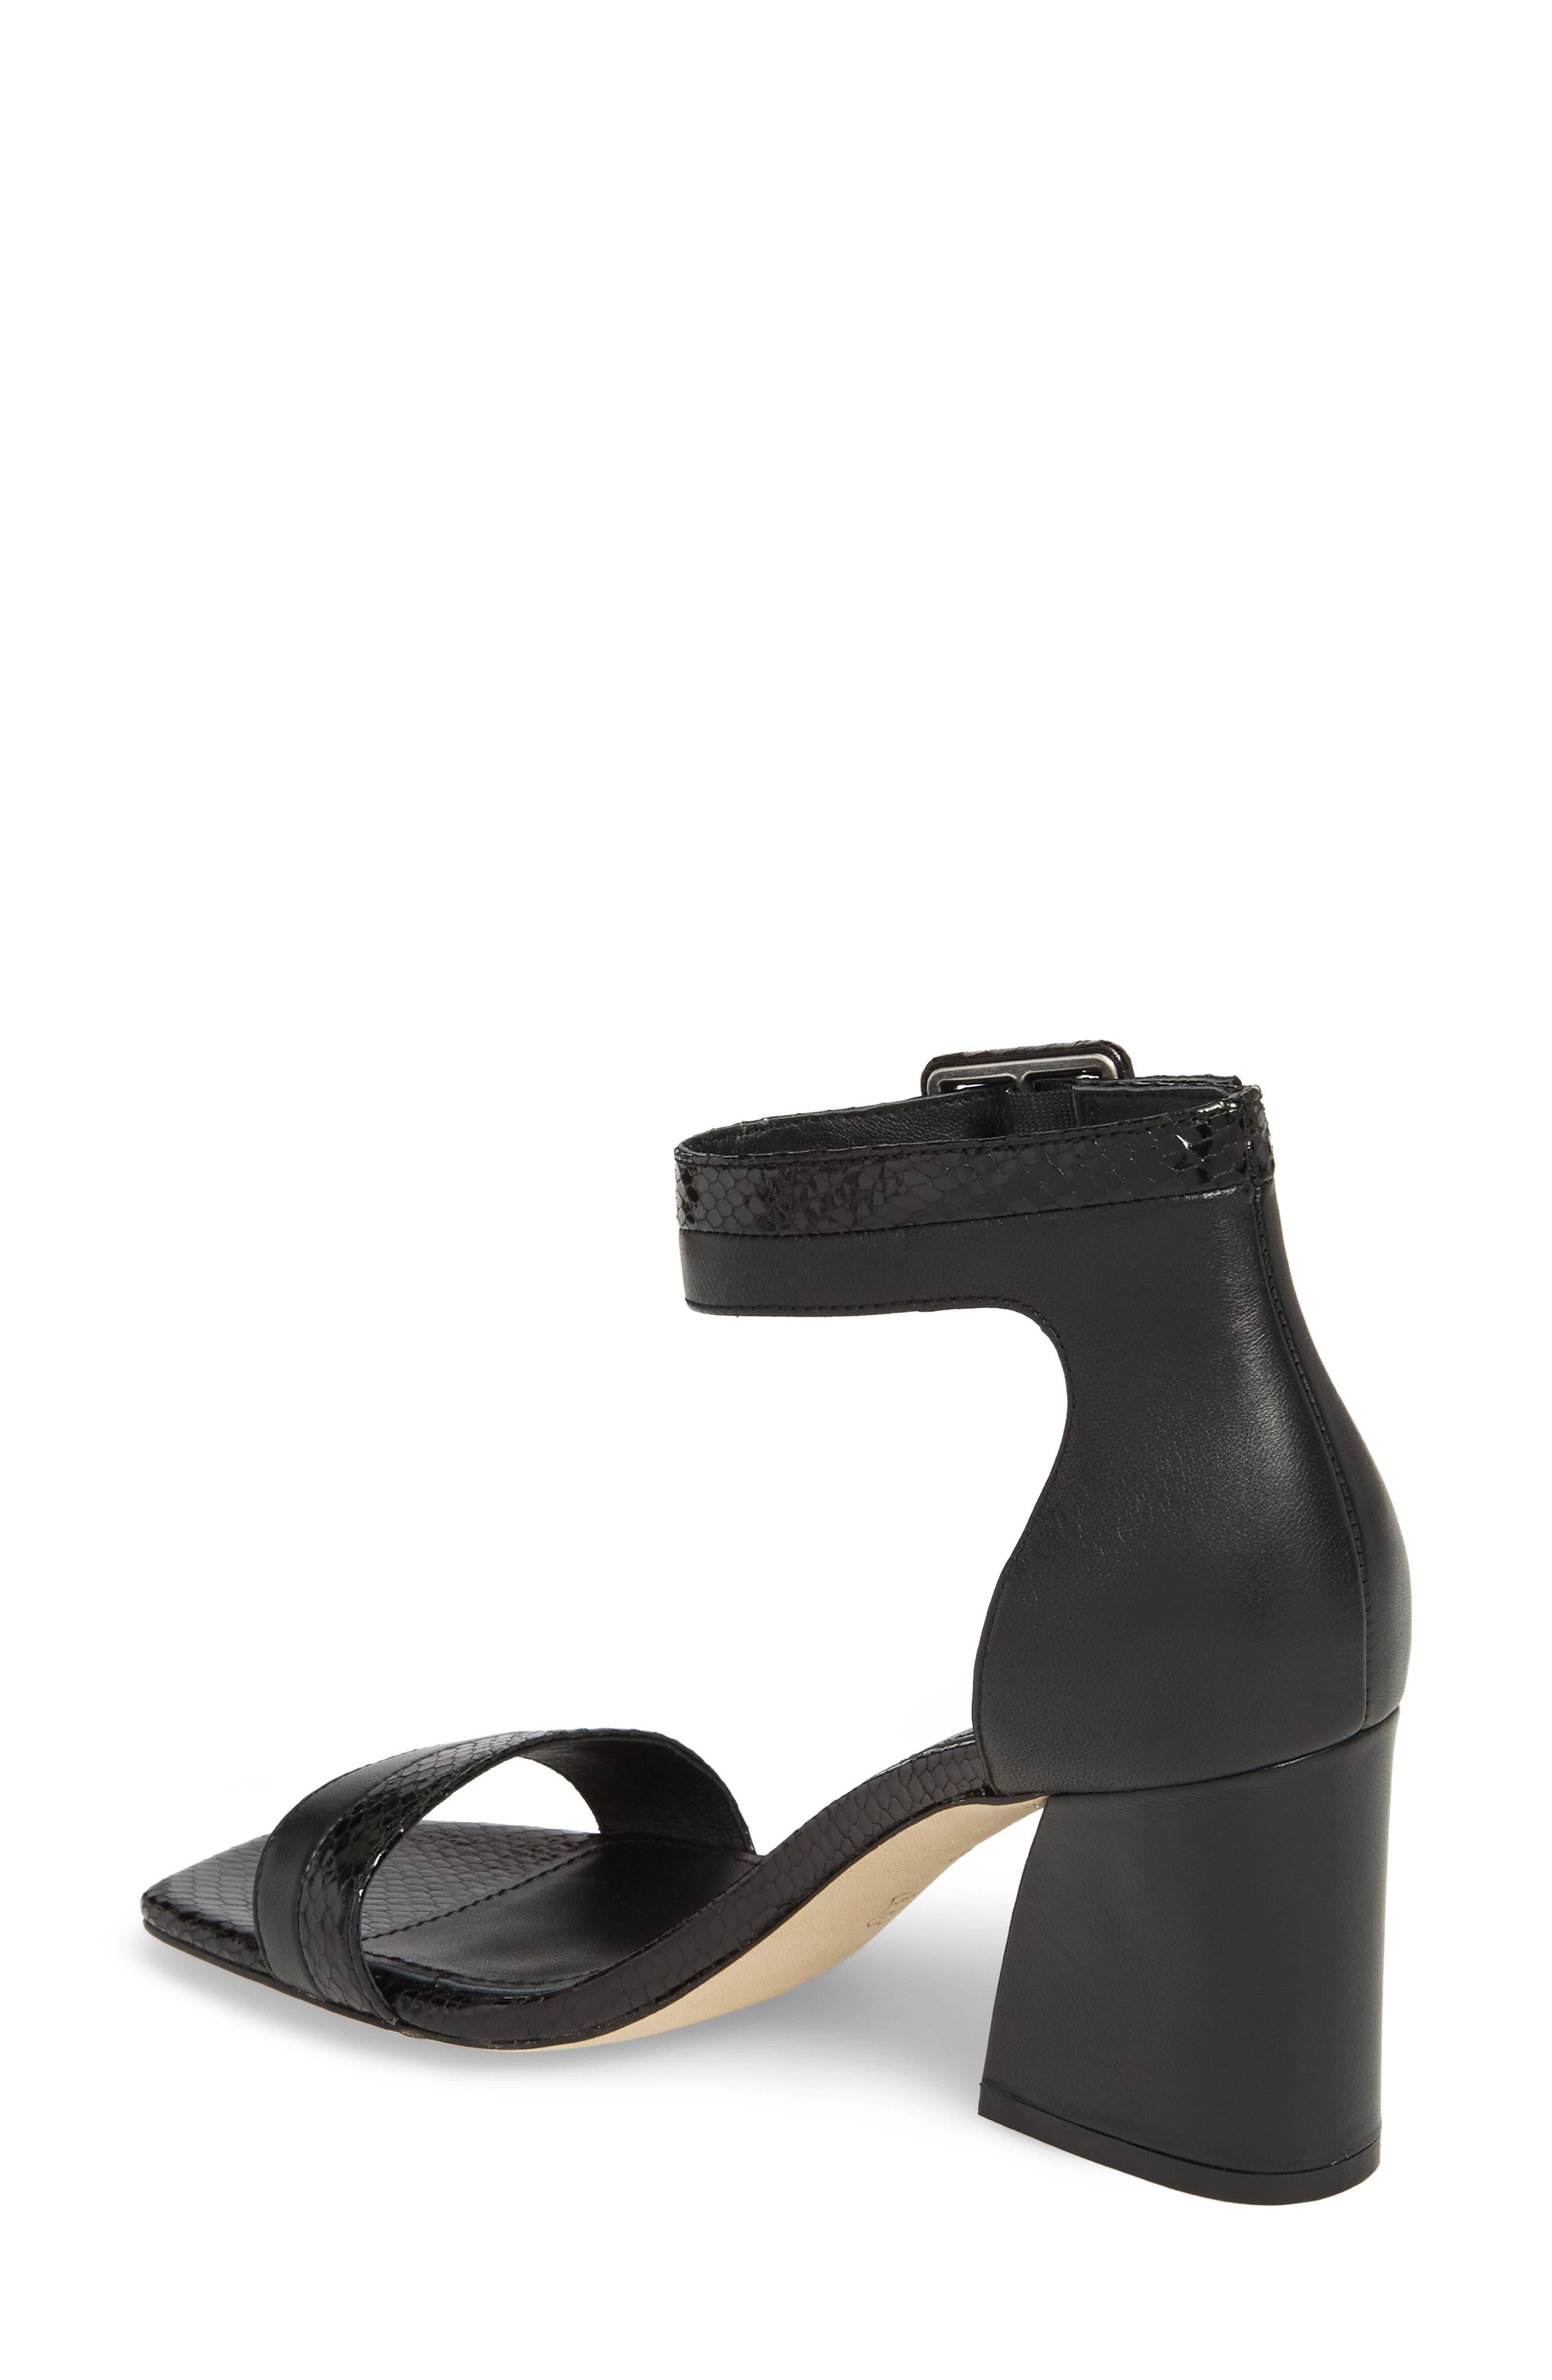 Watson Ankle Strap Sandal,                             Alternate thumbnail 2, color,                             BLACK PRINTED LEATHER